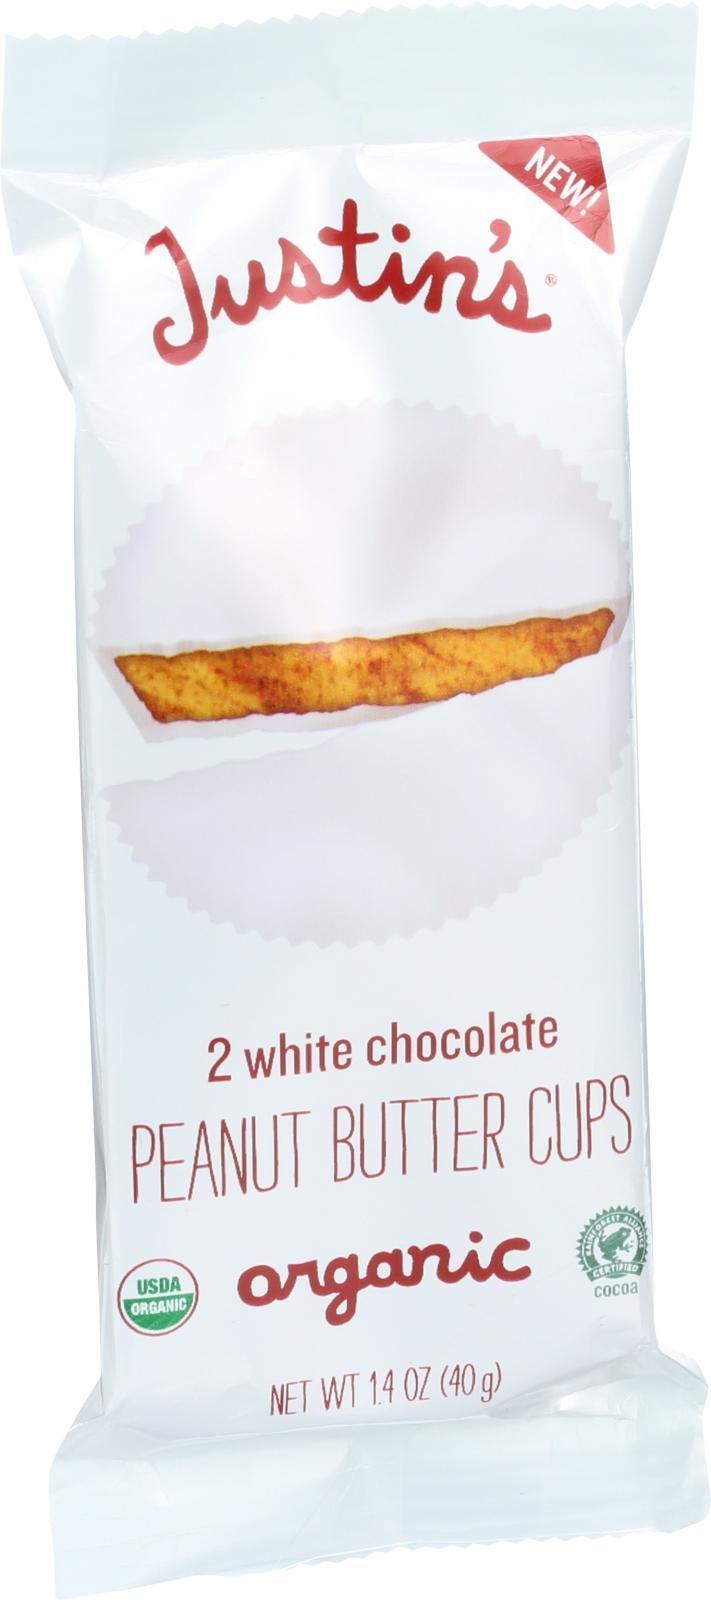 Justin s Nut Butter Organic Peanut Butter Cups - White Chocolate - 1.4 oz - Case of 12 - 95%+ Organic - Kosher - Gluten free